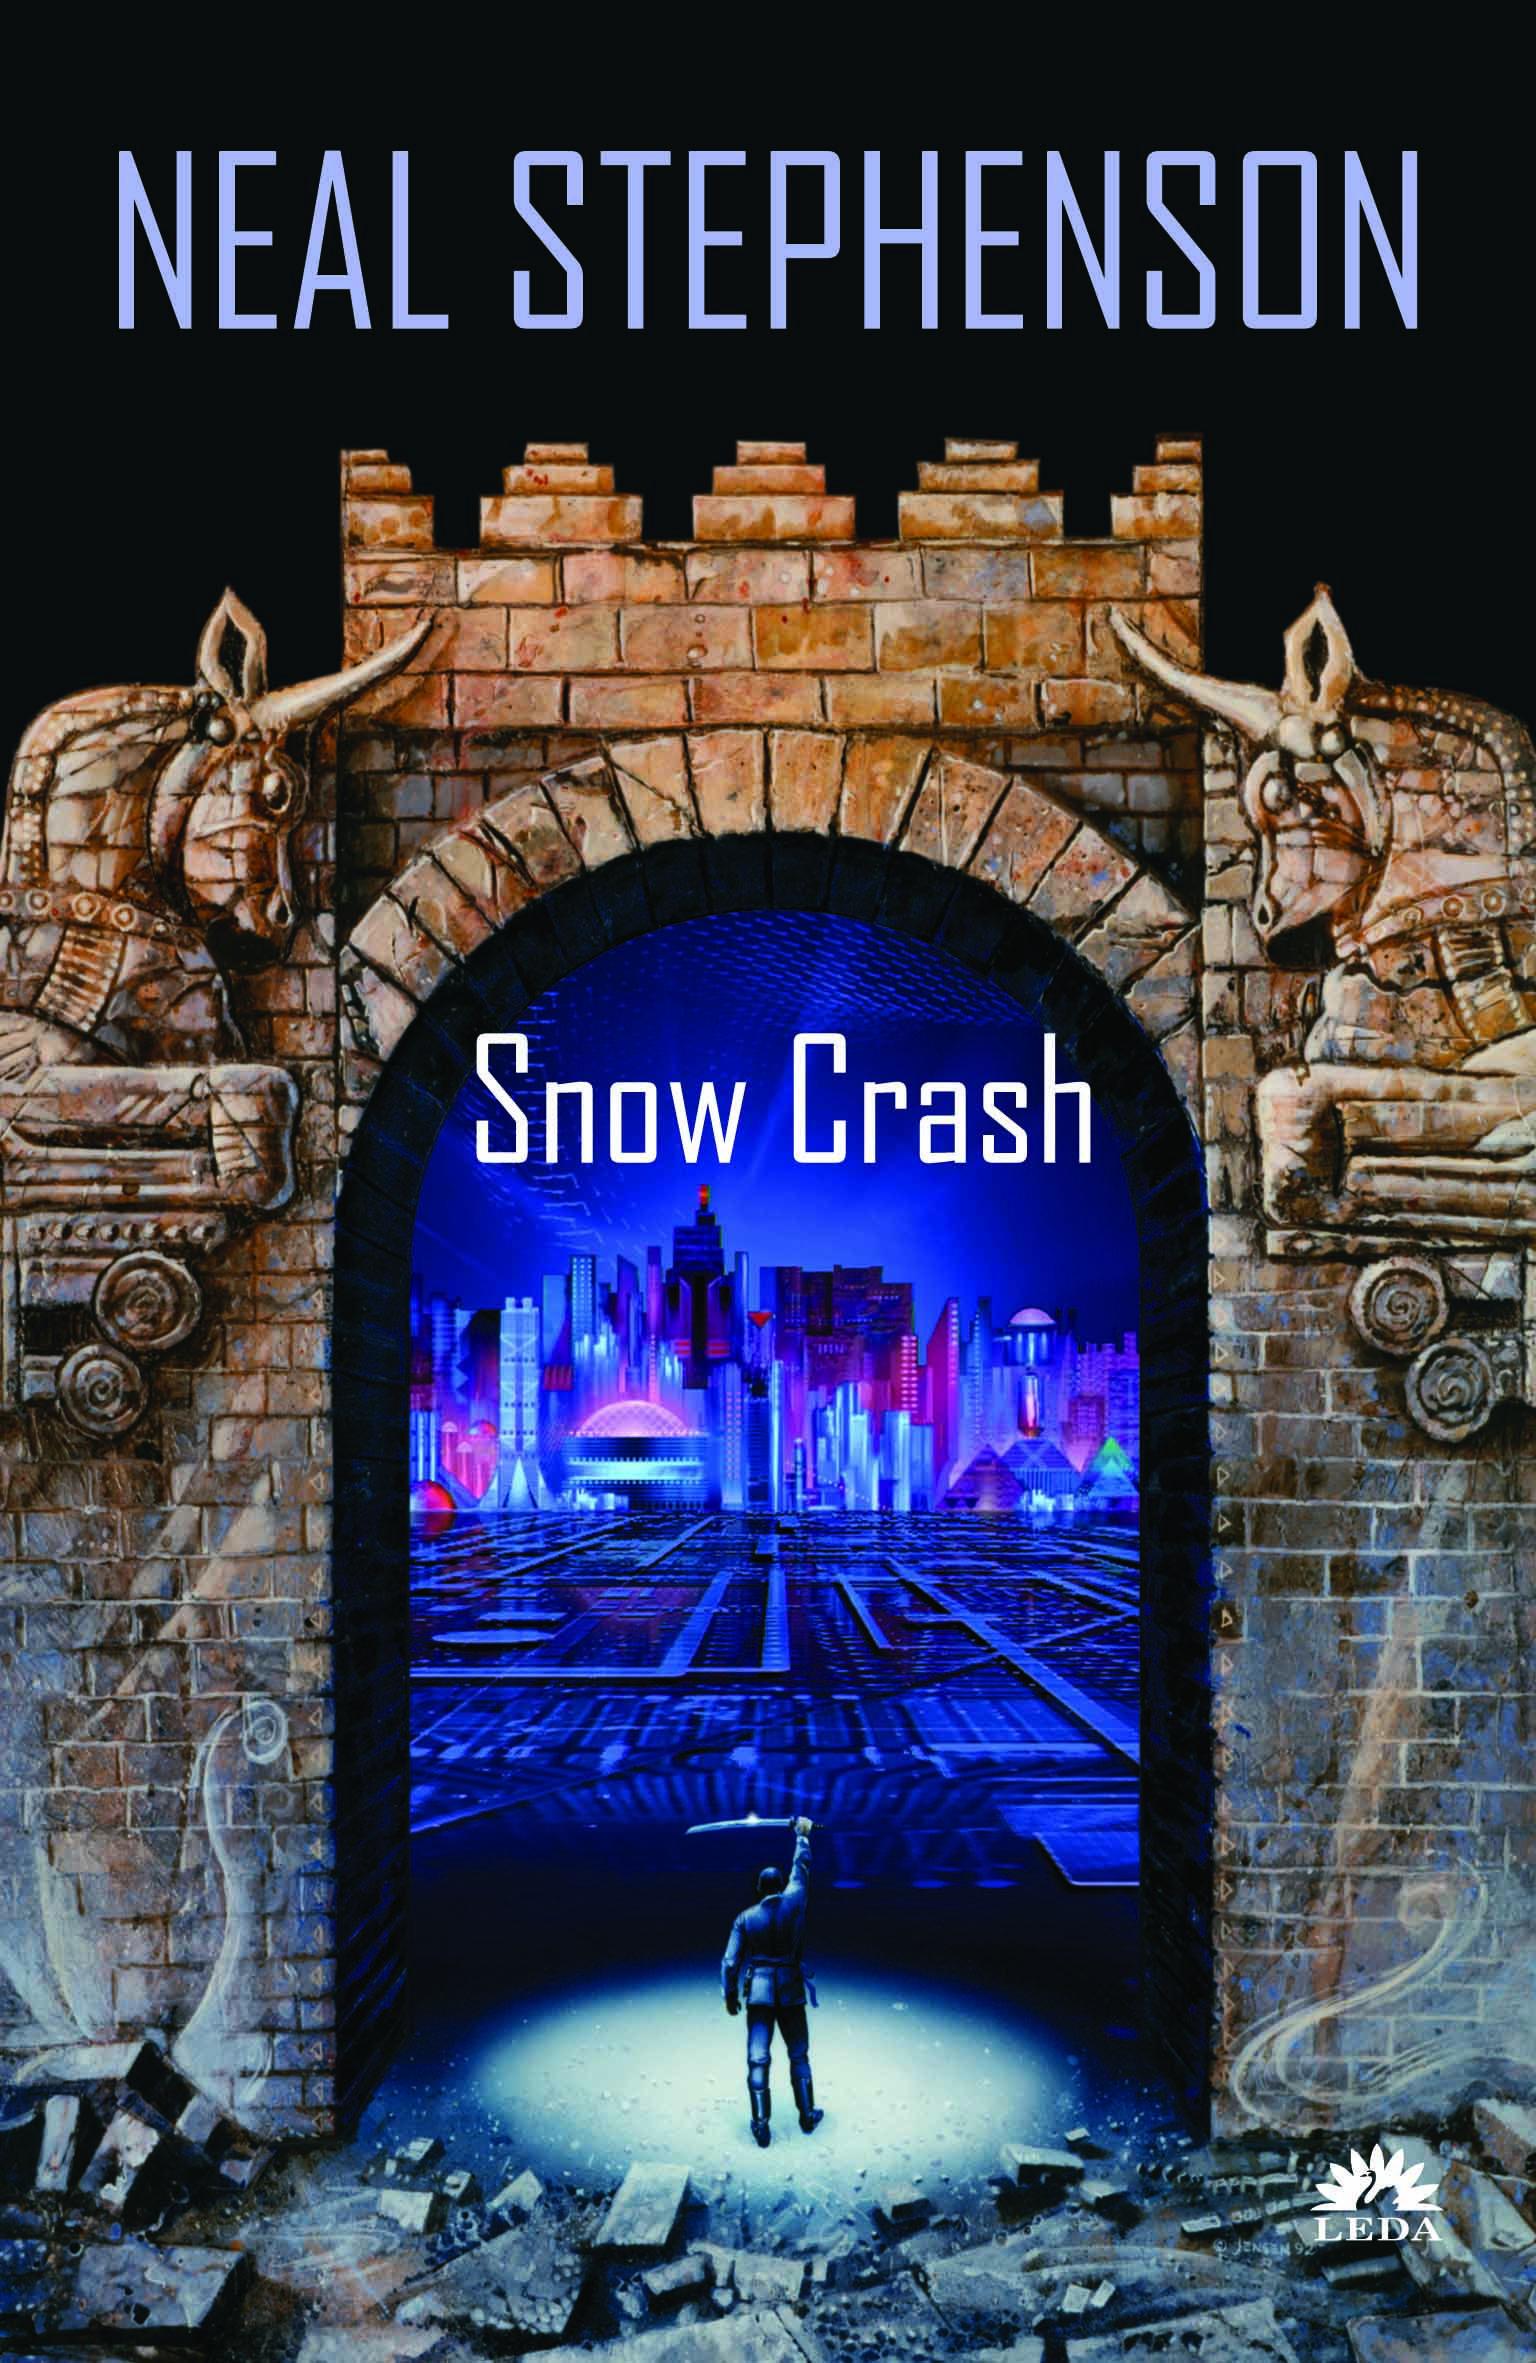 Neal Stephenson - Snow Crash